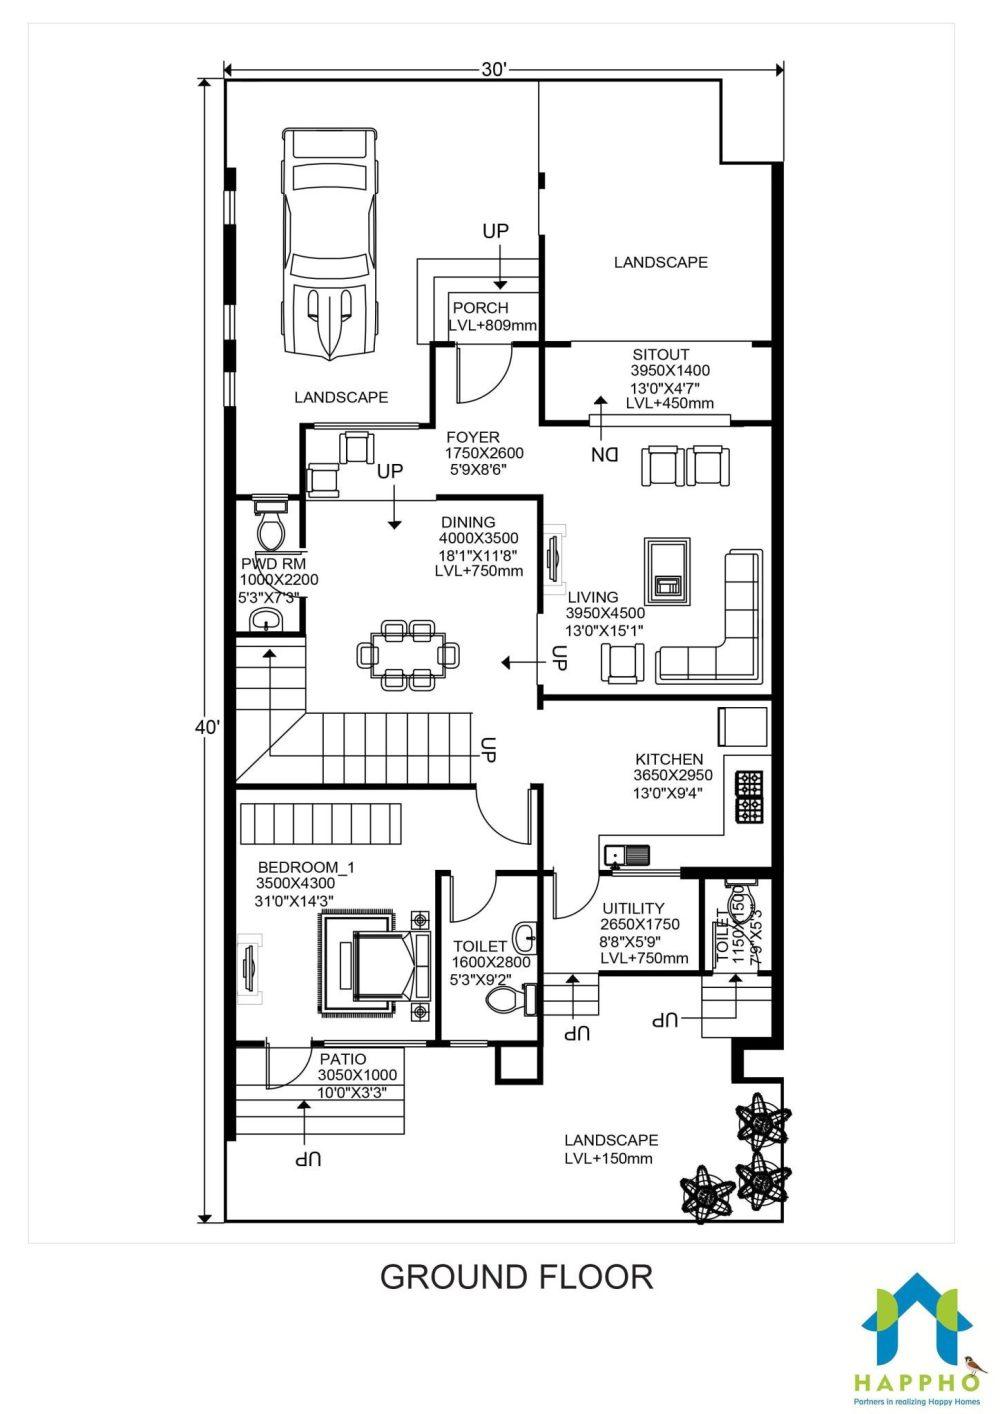 medium resolution of floor plan for 30 x 40 feet plot 3 bhk 1200 square feet 134 sq